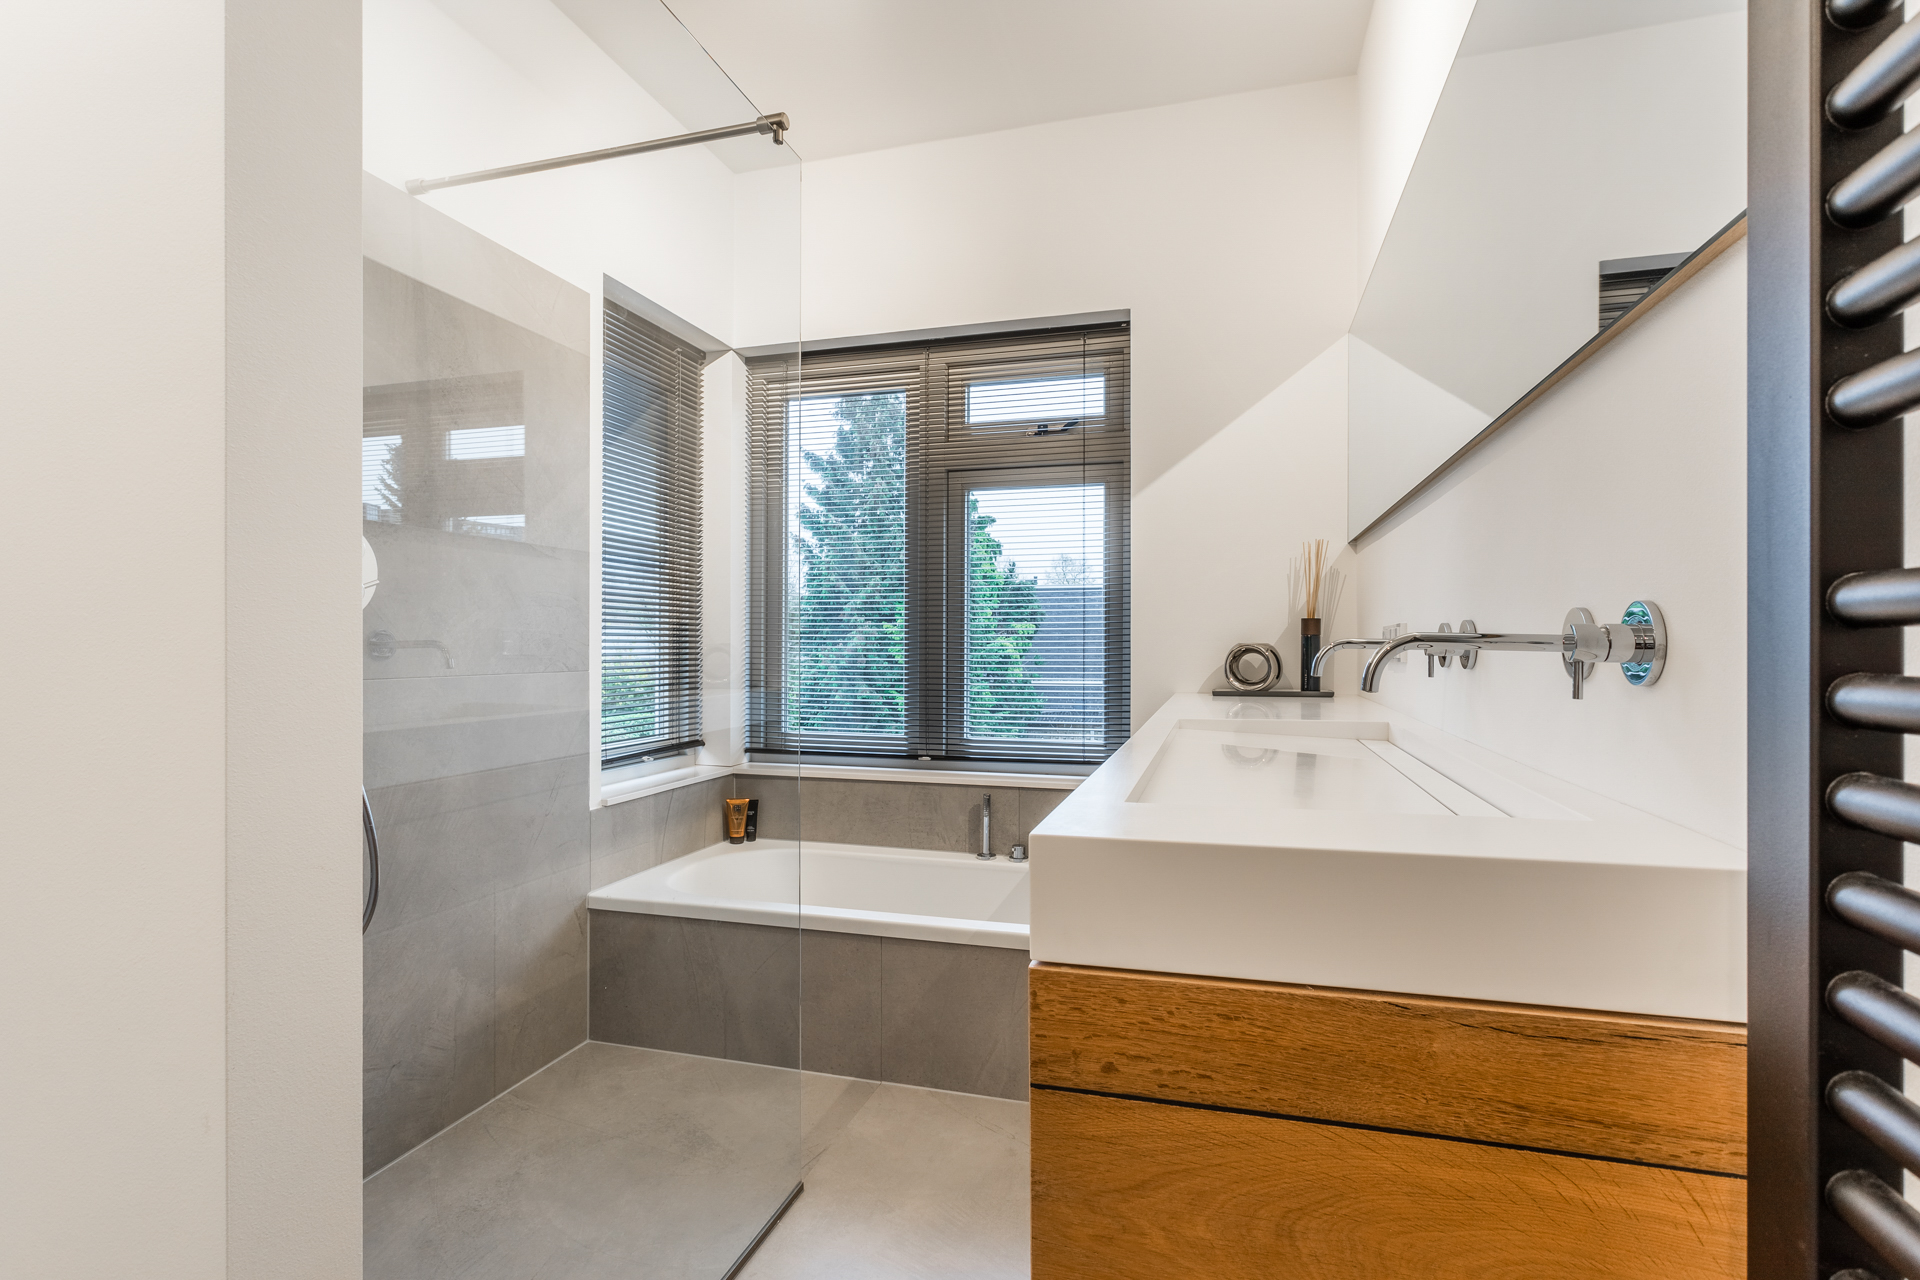 van-Os-architecten-verbouwing-2-onder-1-kapper-Valkenierslaan-Breda-luxe-entree-met-visgraat-parketvloer